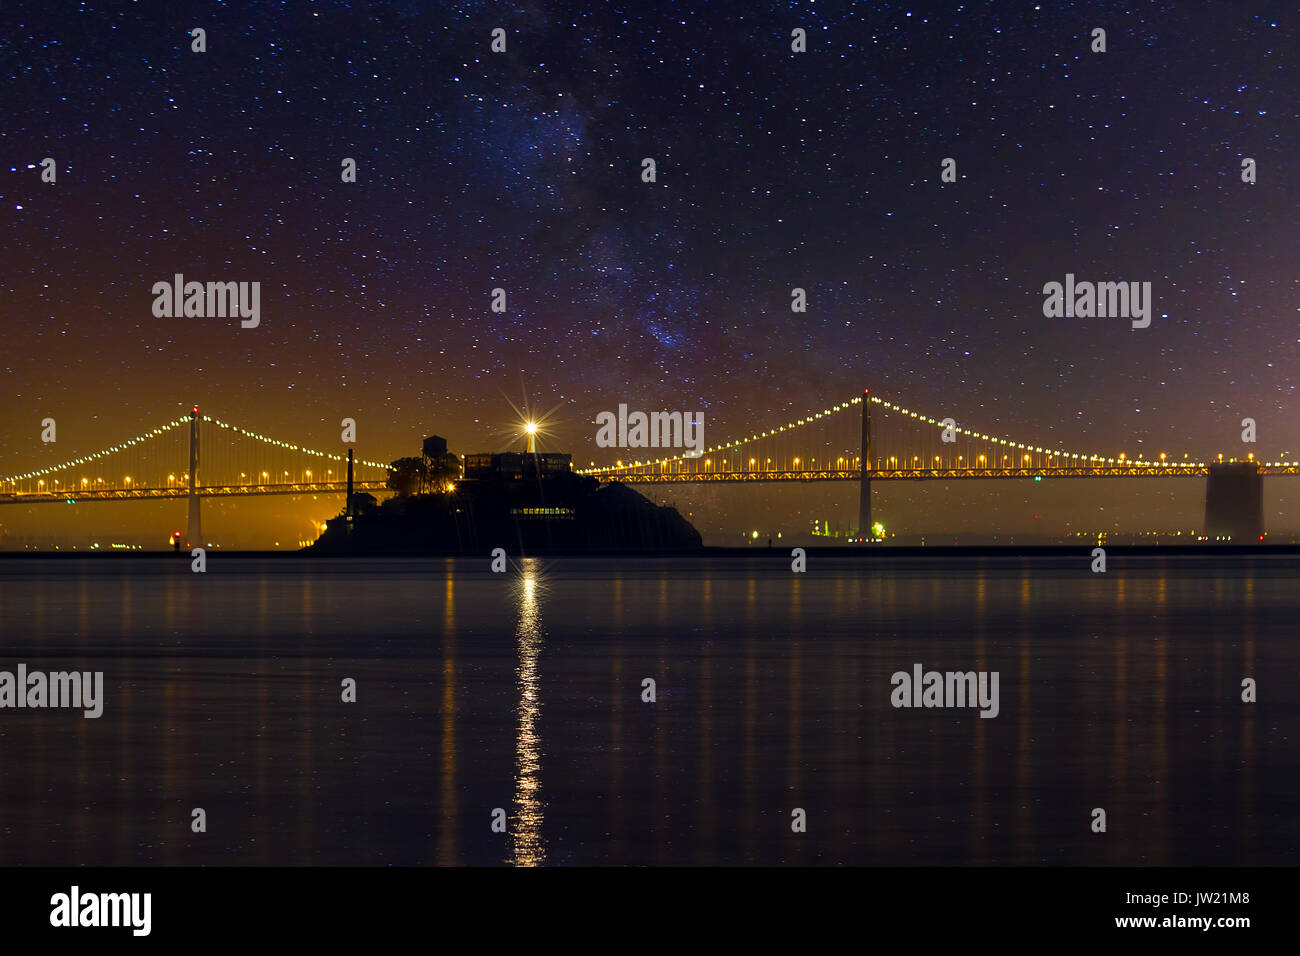 Alcatraz Island in San Francisco California under the Stars at night - Stock Image